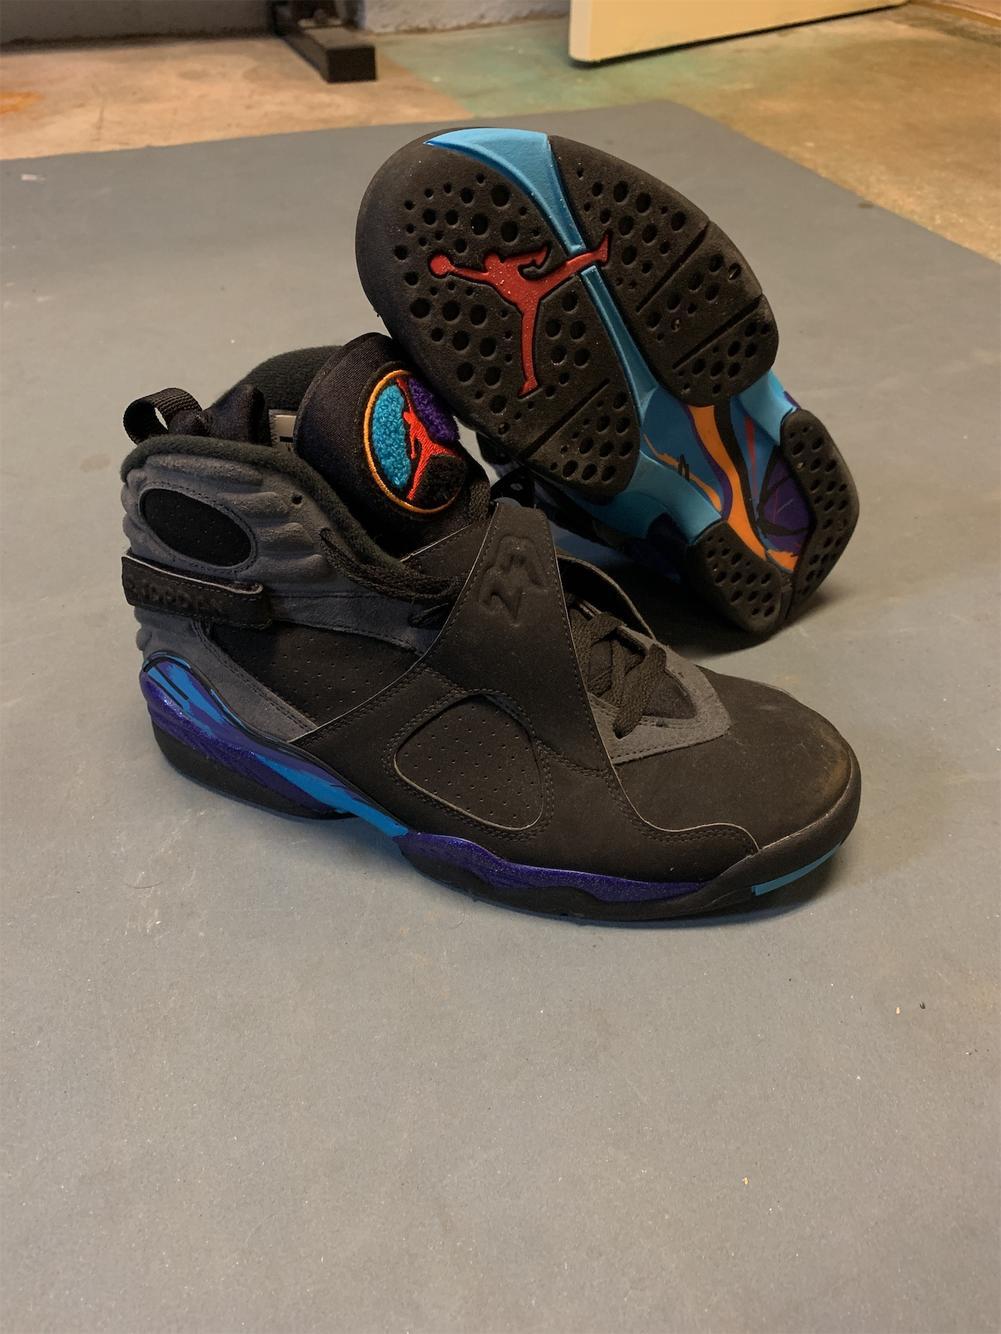 Black Men's Size 8.5 (Women's 9.5) Air Jordan Shoes | SidelineSwap